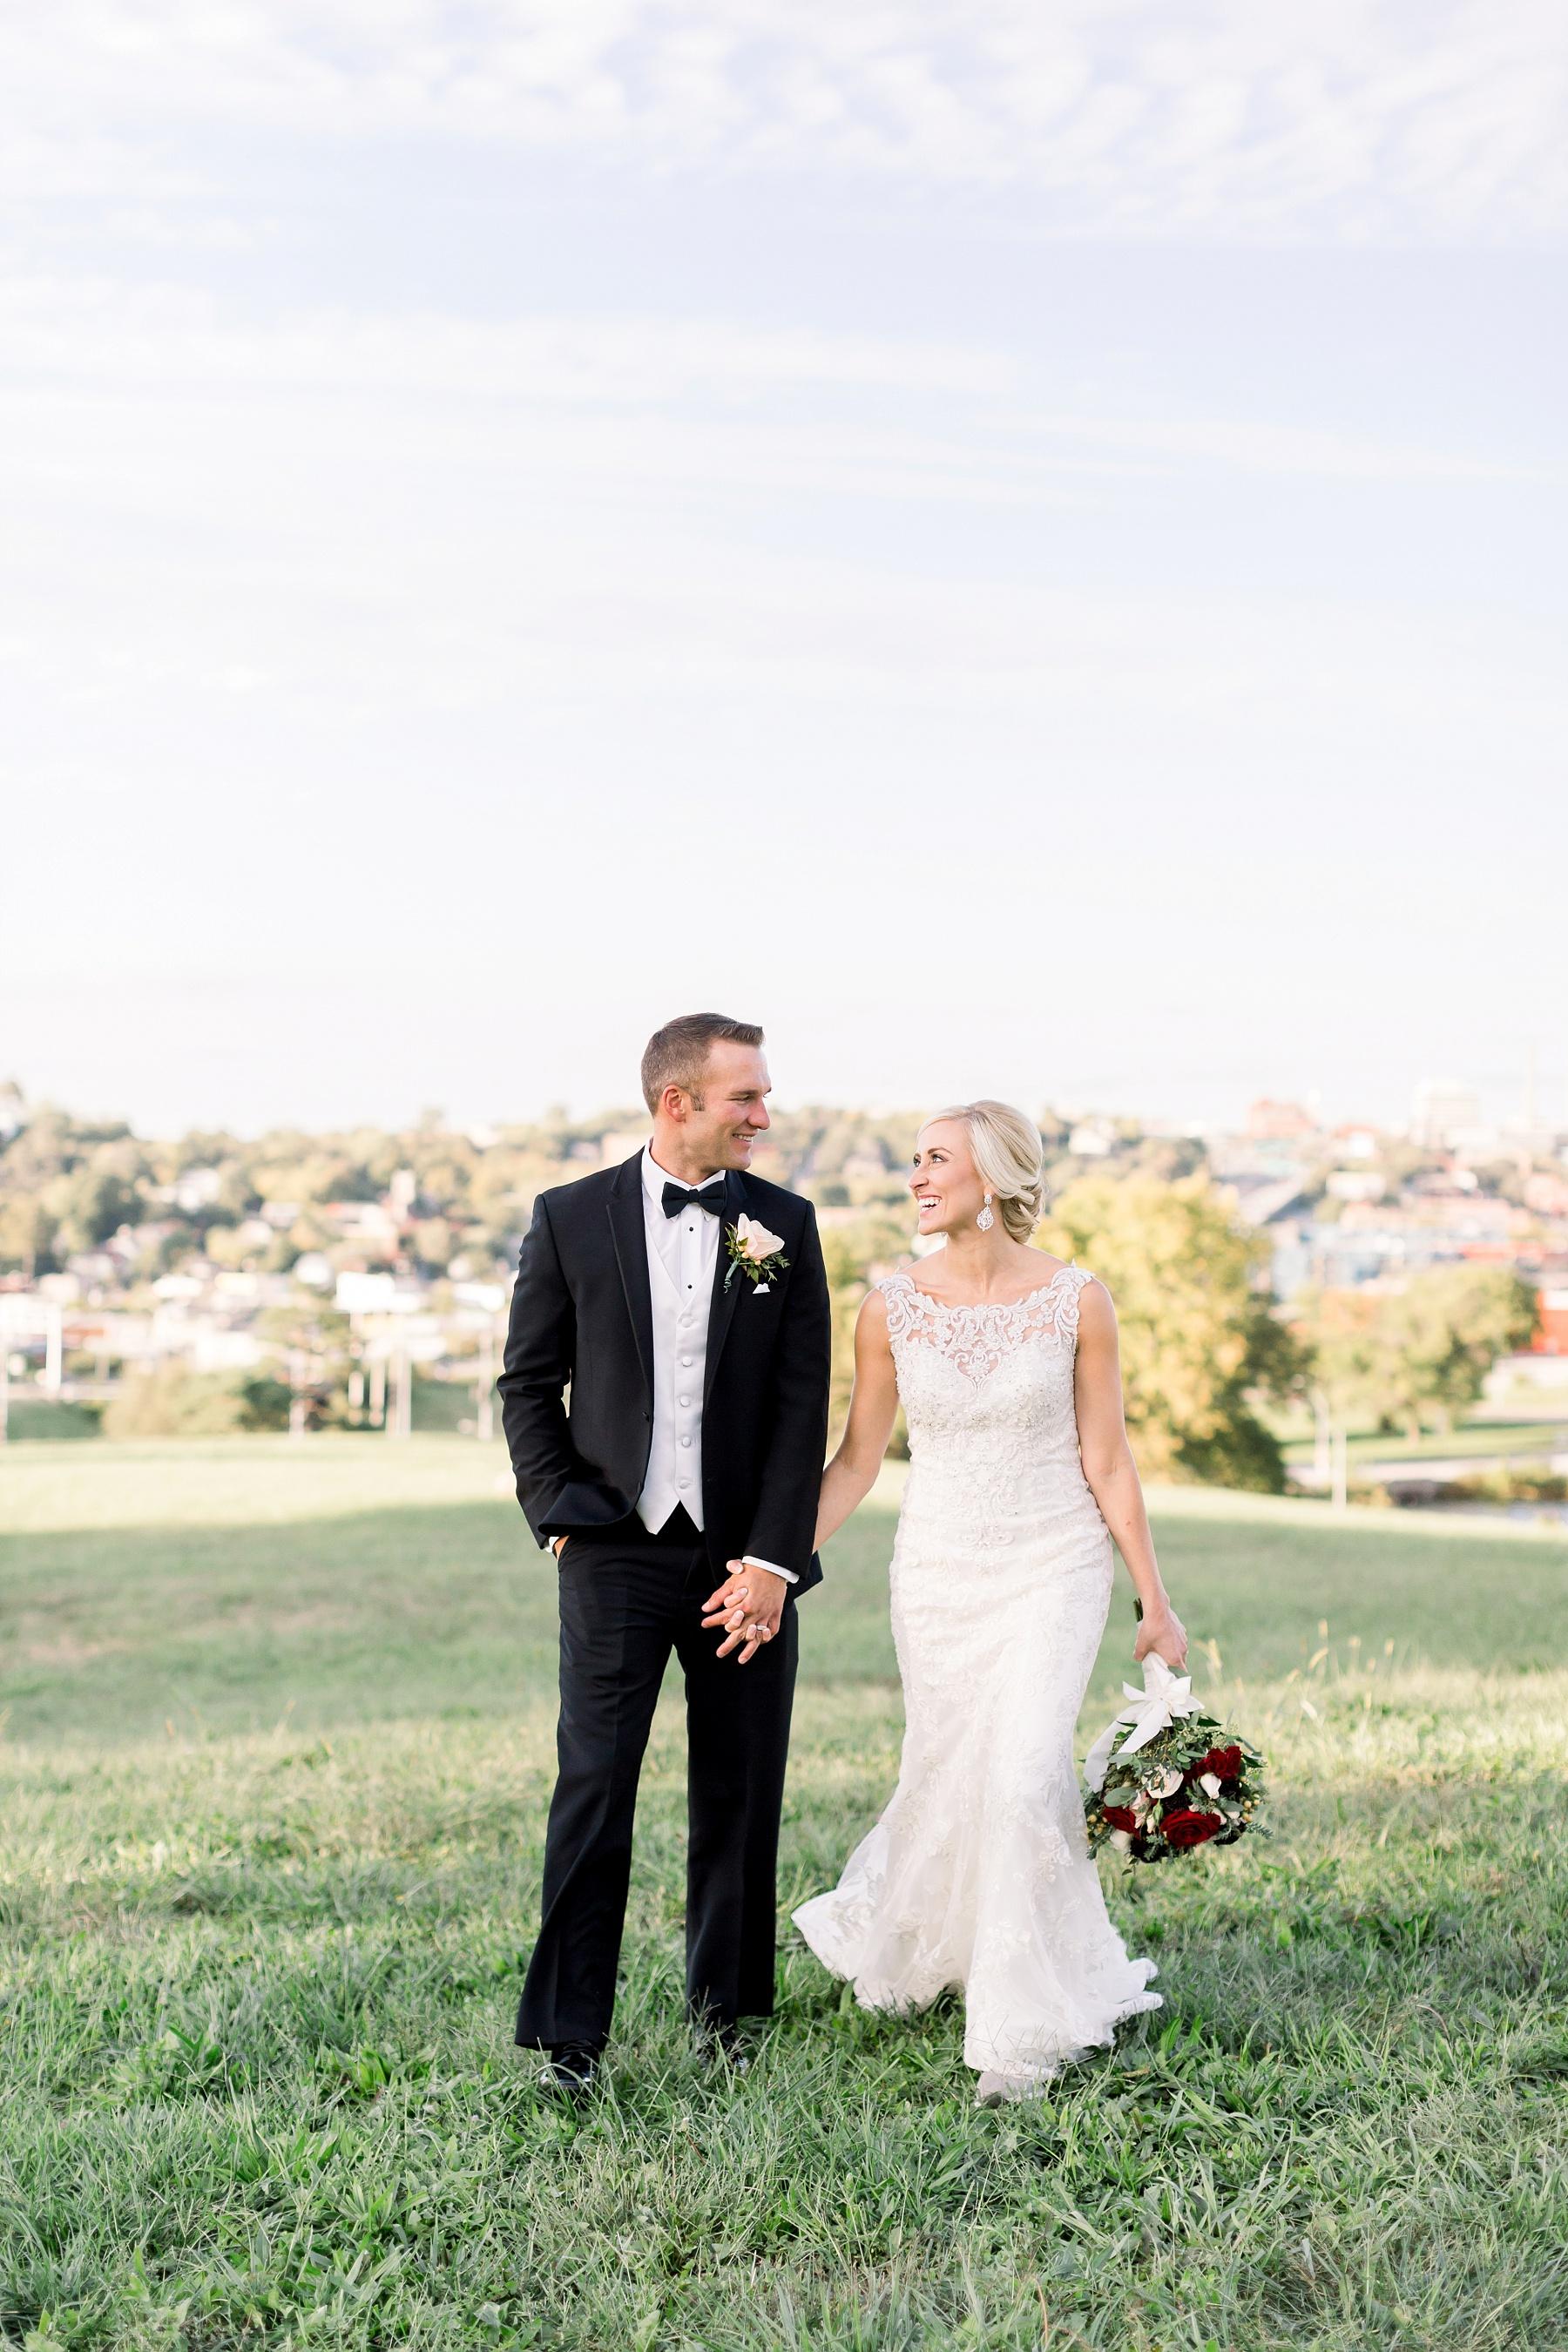 midwest-adventurous-wedding-photographer-elizabeth-ladean-photography-photo_4795.jpg